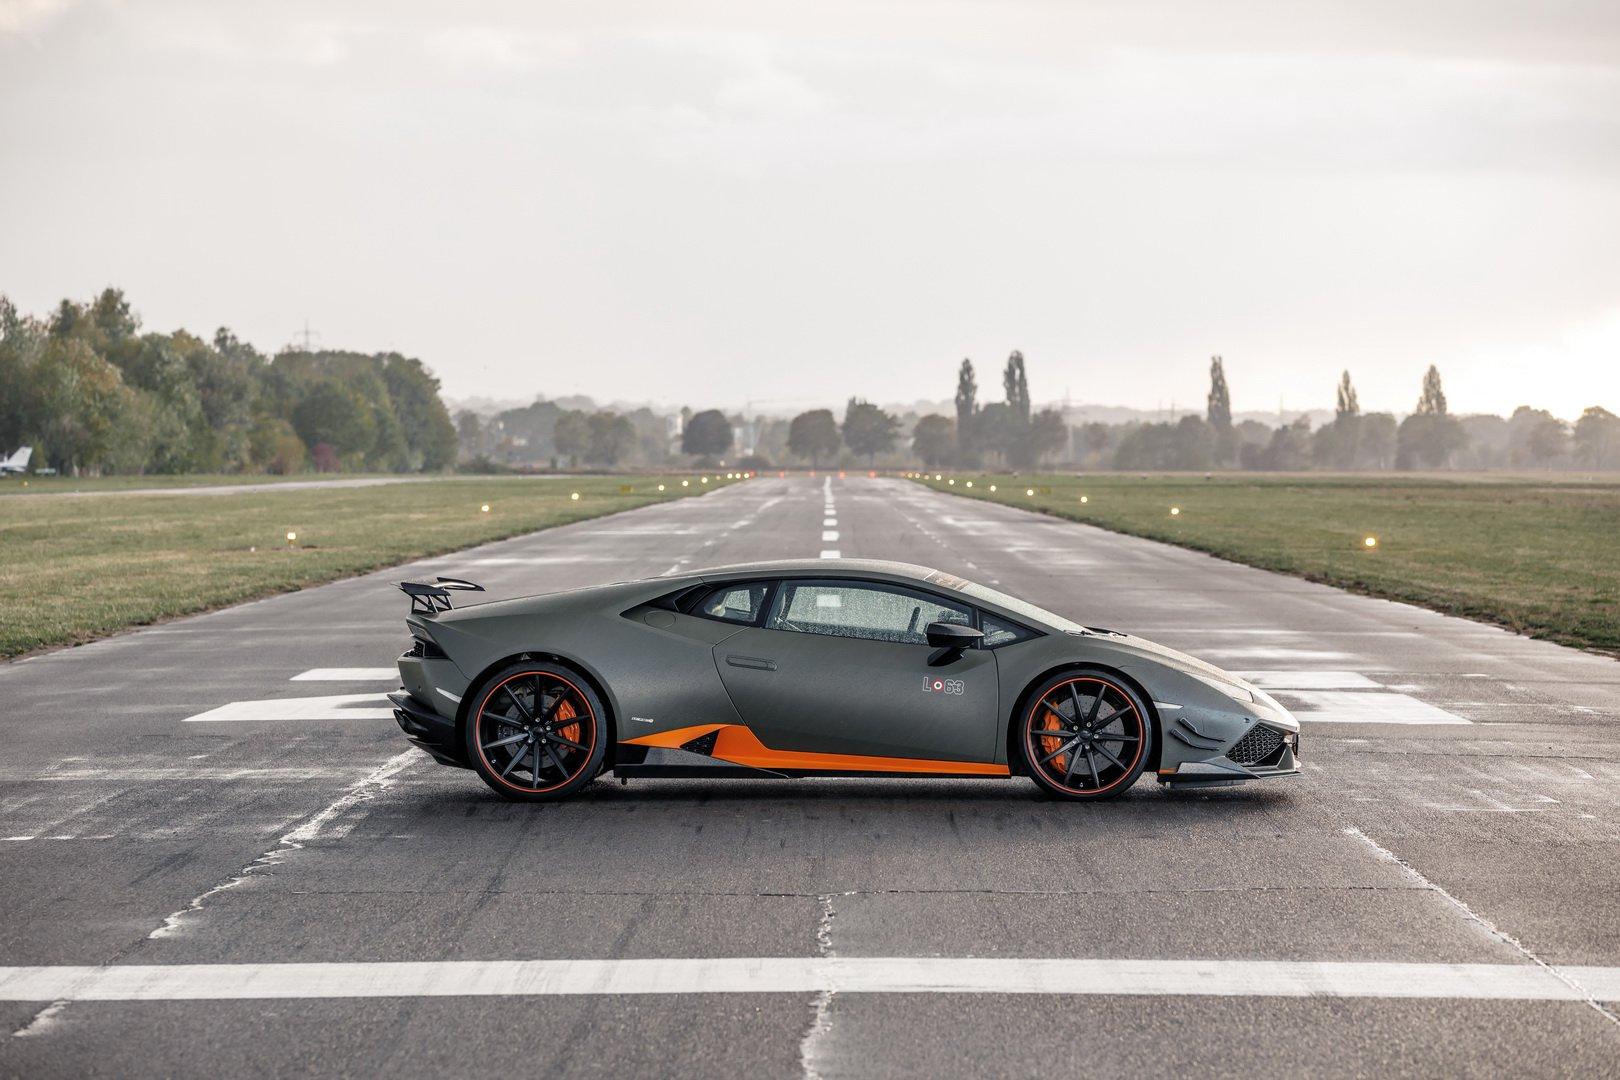 Lamborghini Huracan Avio by Luethen Motorsport (18)